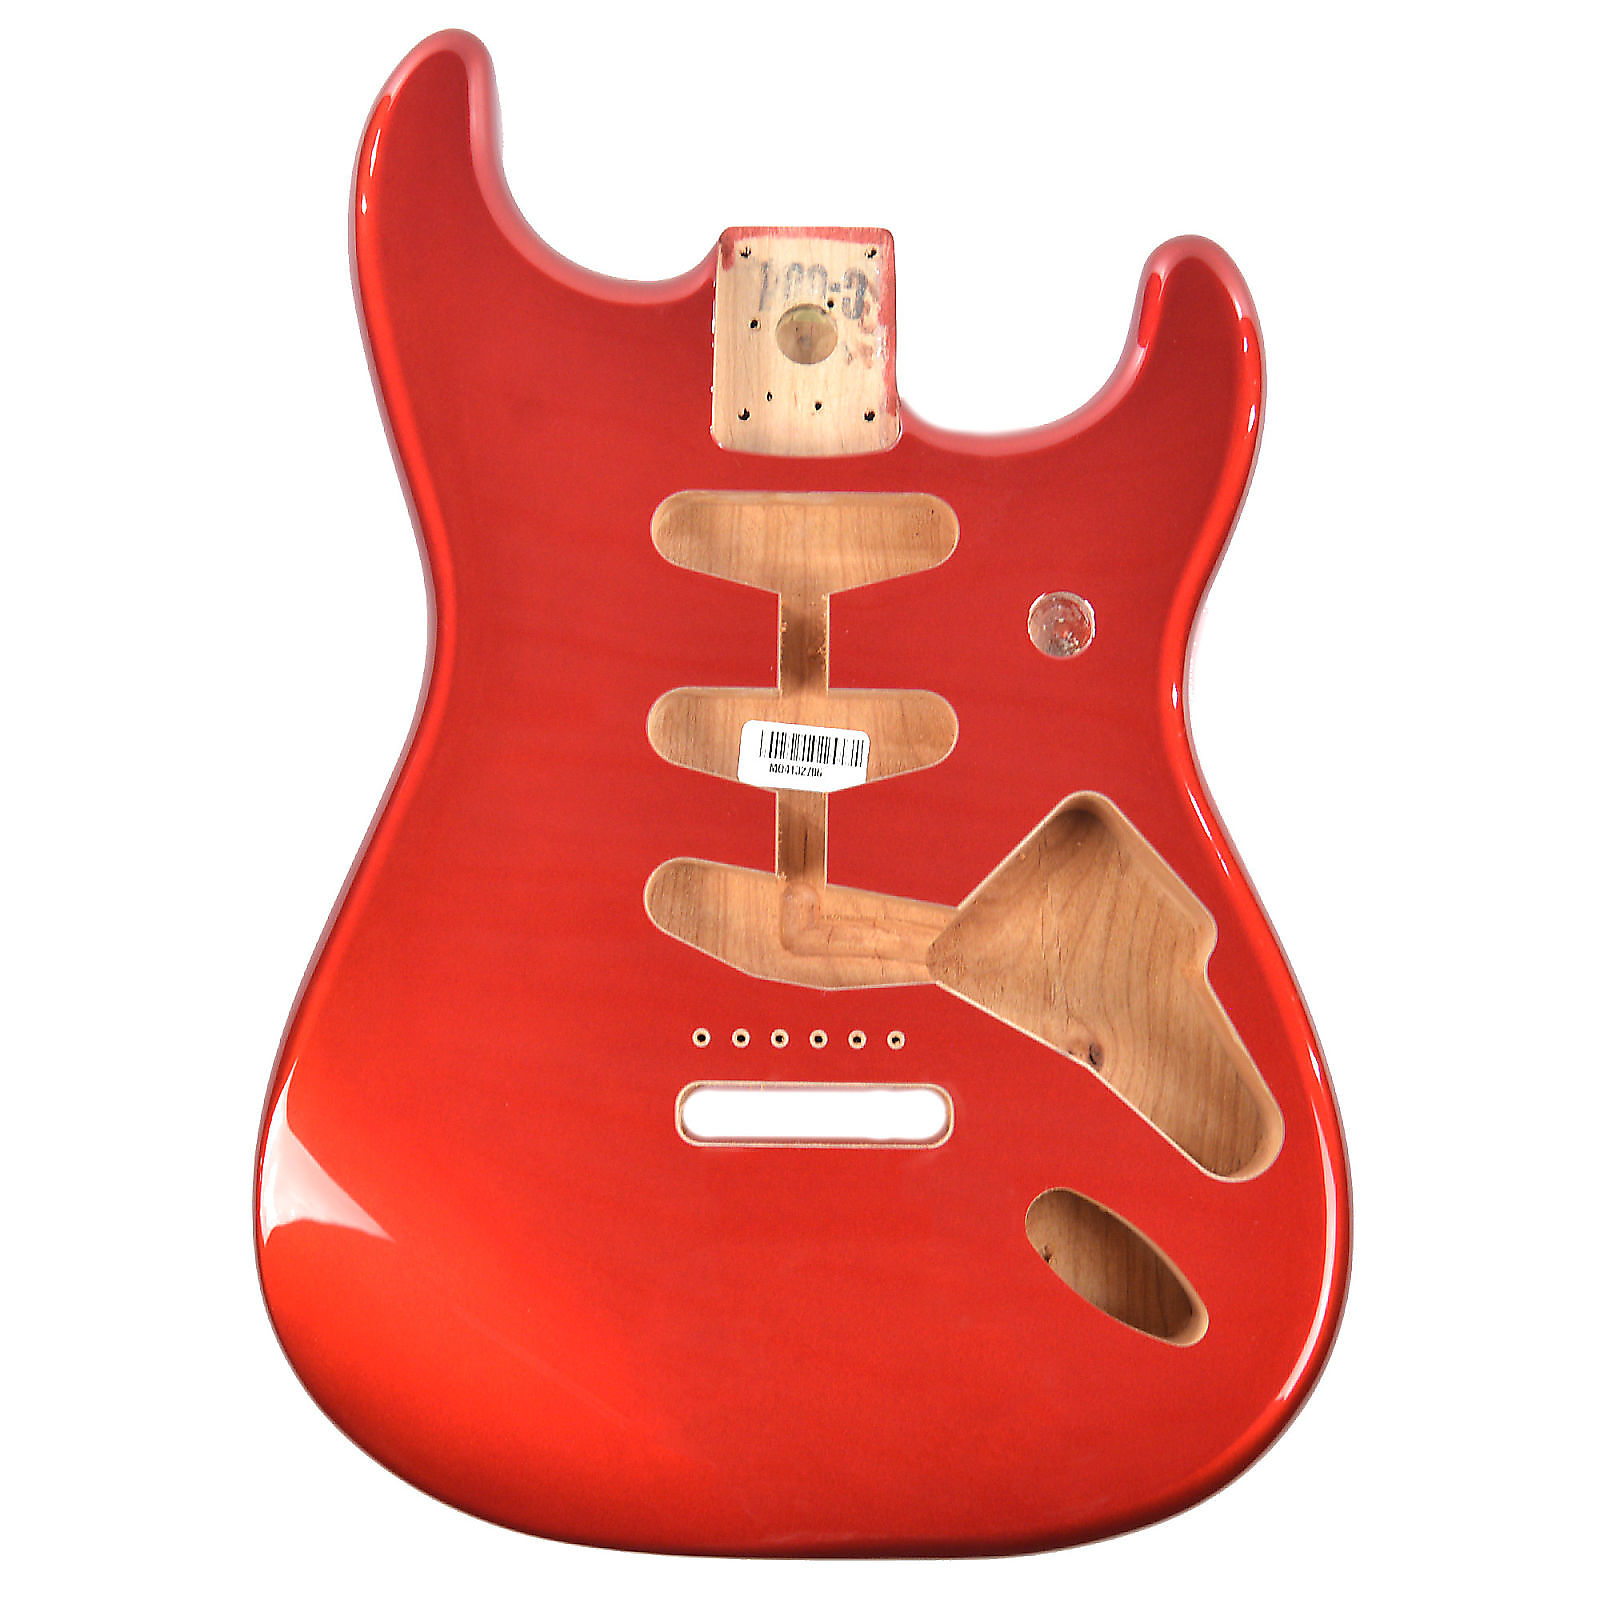 BLACK Fender Mexico Stratocaster//Strat SSS Vintage Bridge Mount Alder Body